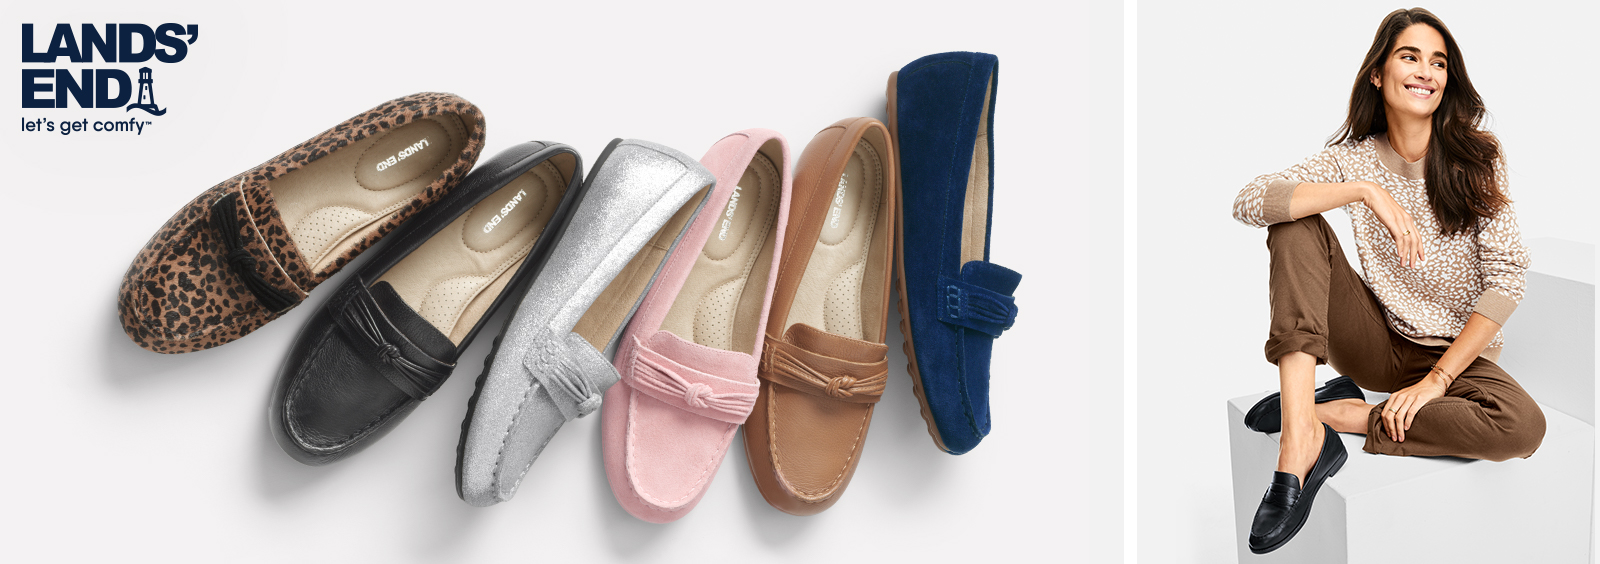 Most Flattering Footwear Options